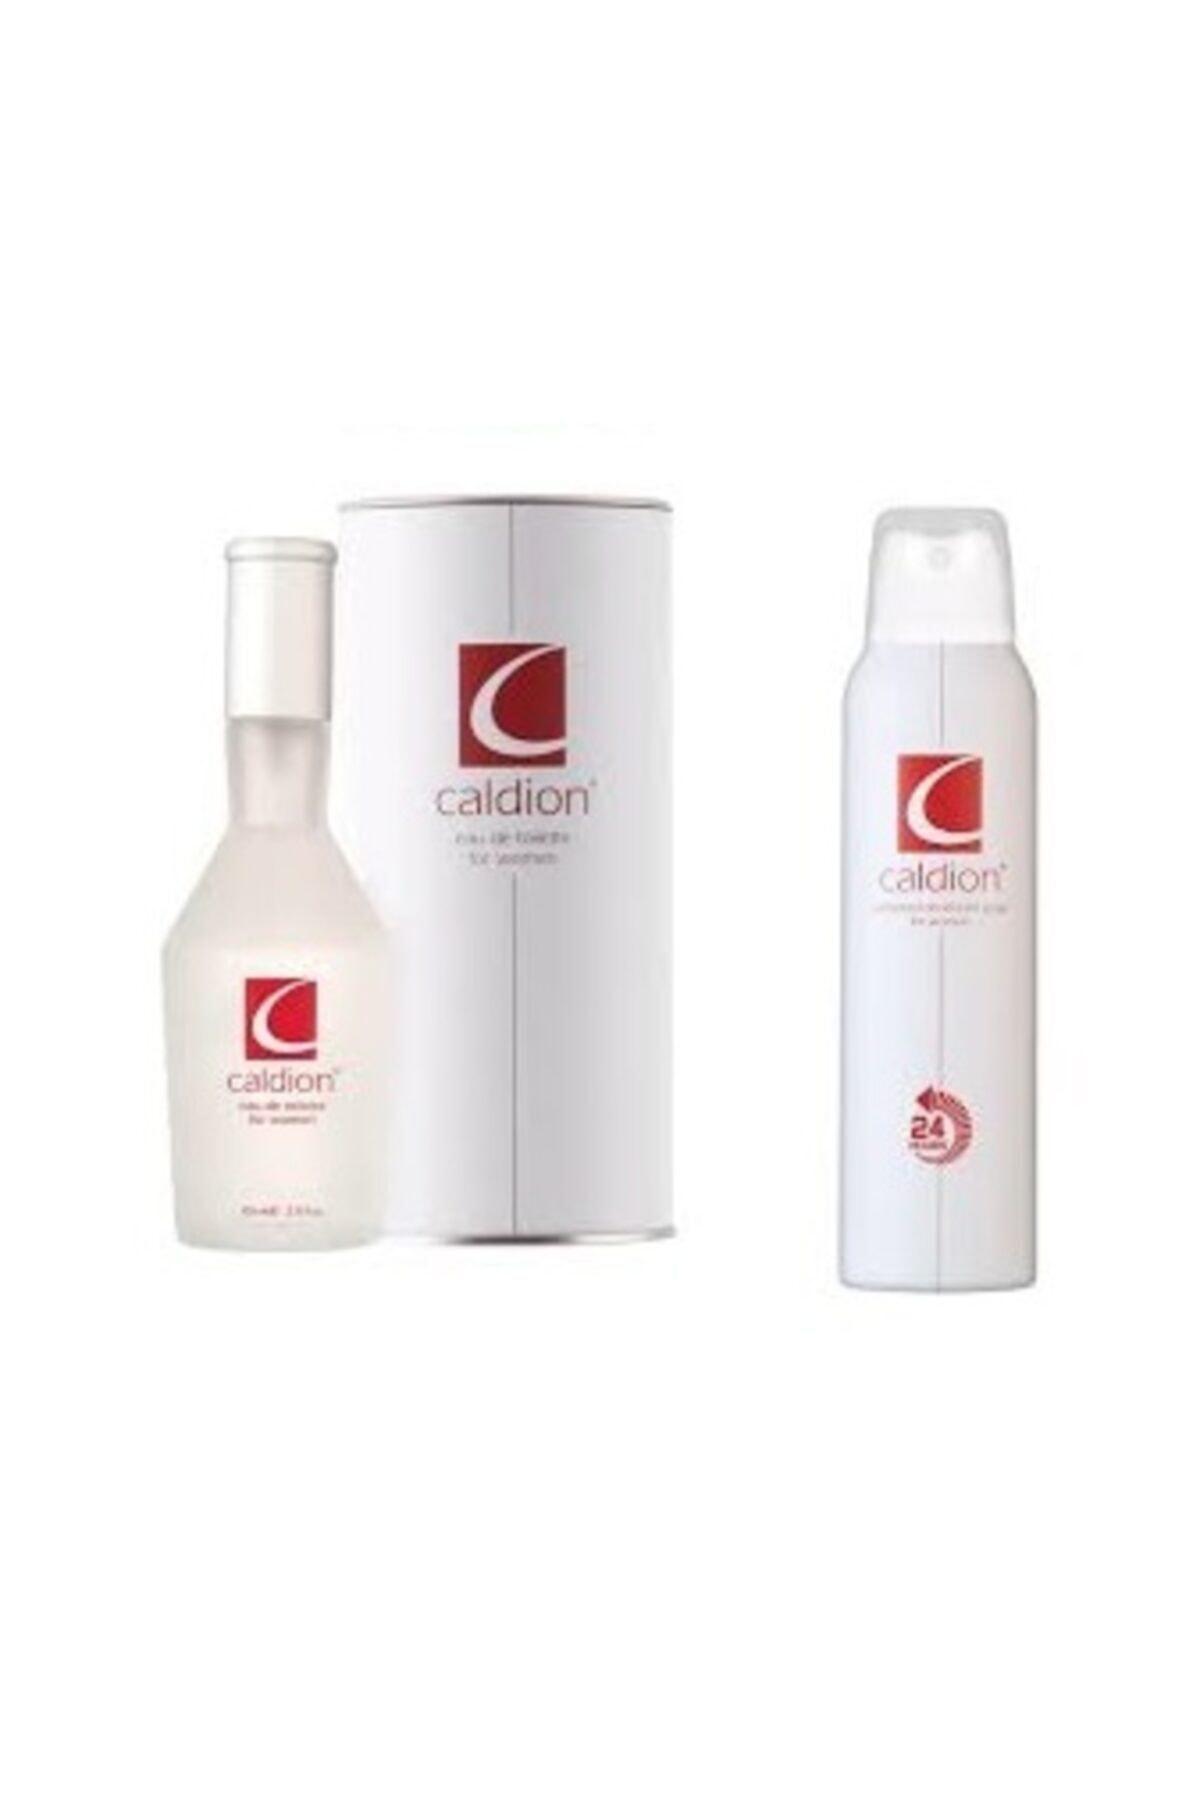 Caldion Orıjınal For Women Edt 100 Ml Kadın Parfüm + 150 Ml Deodorant Ikili Set 1